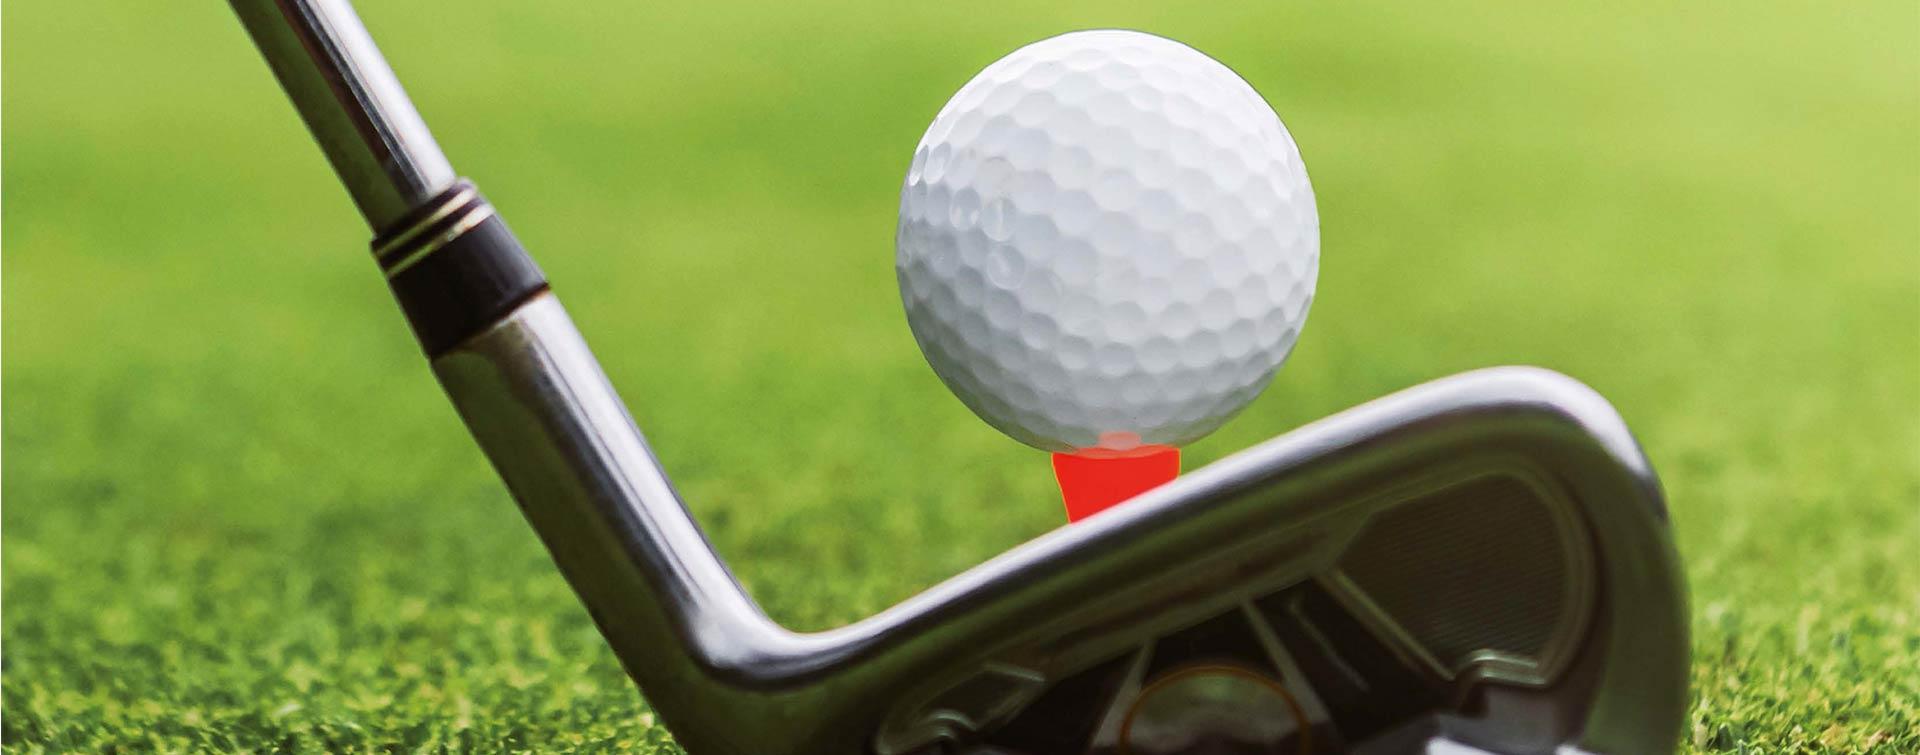 Gráfico Torneo de golf Benéfico AECC abril 2021